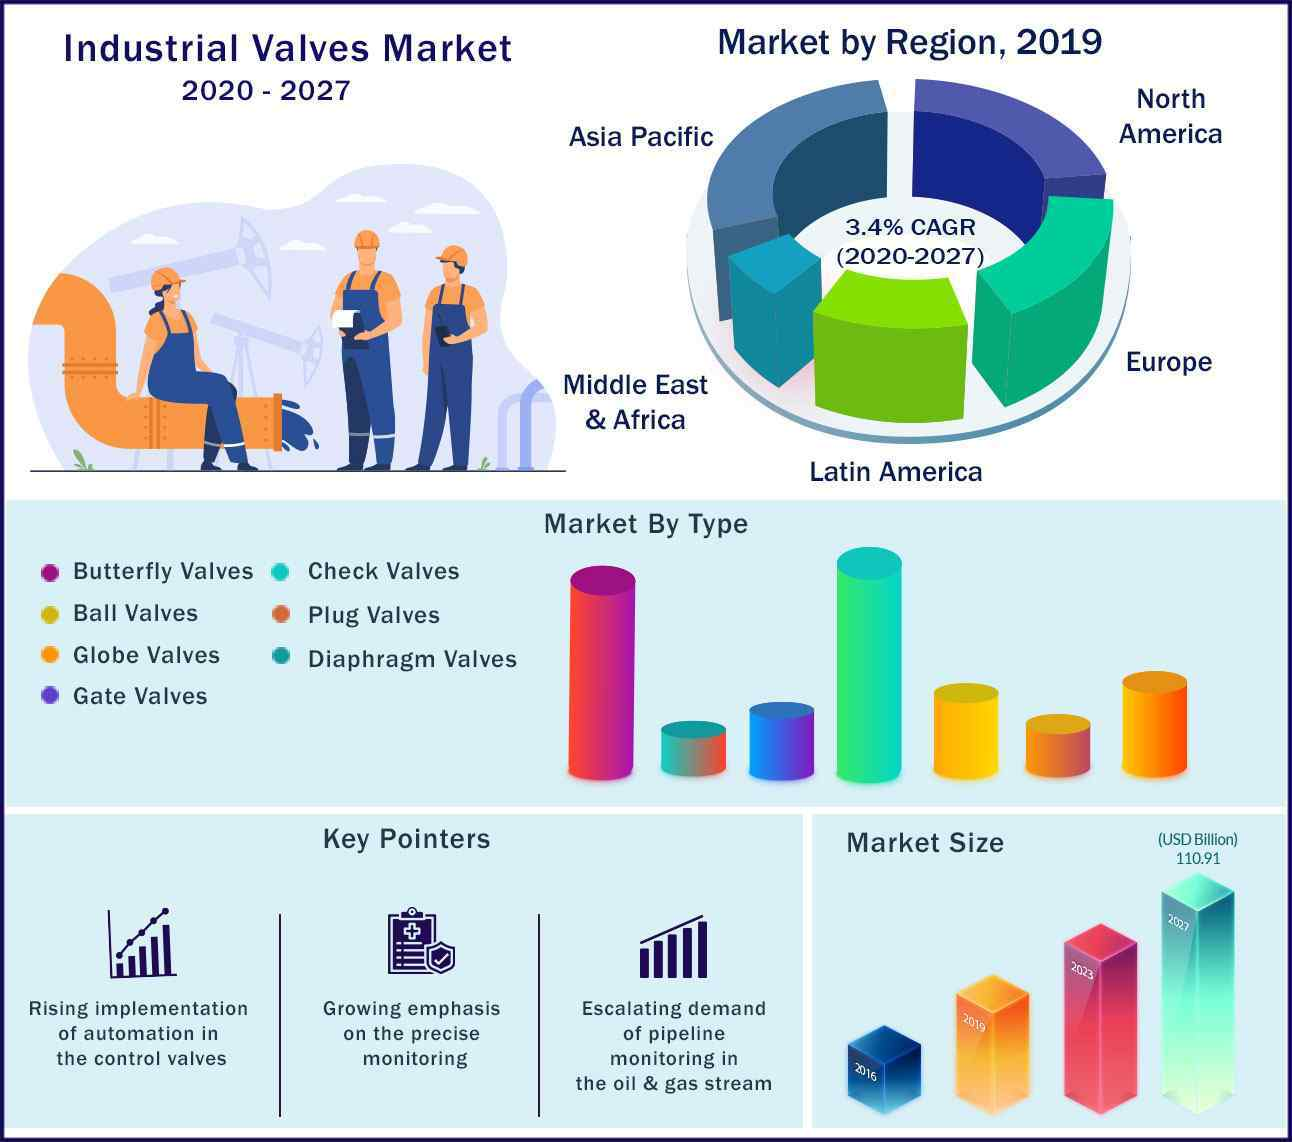 Global Industrial Valves Market 2020 to 2027